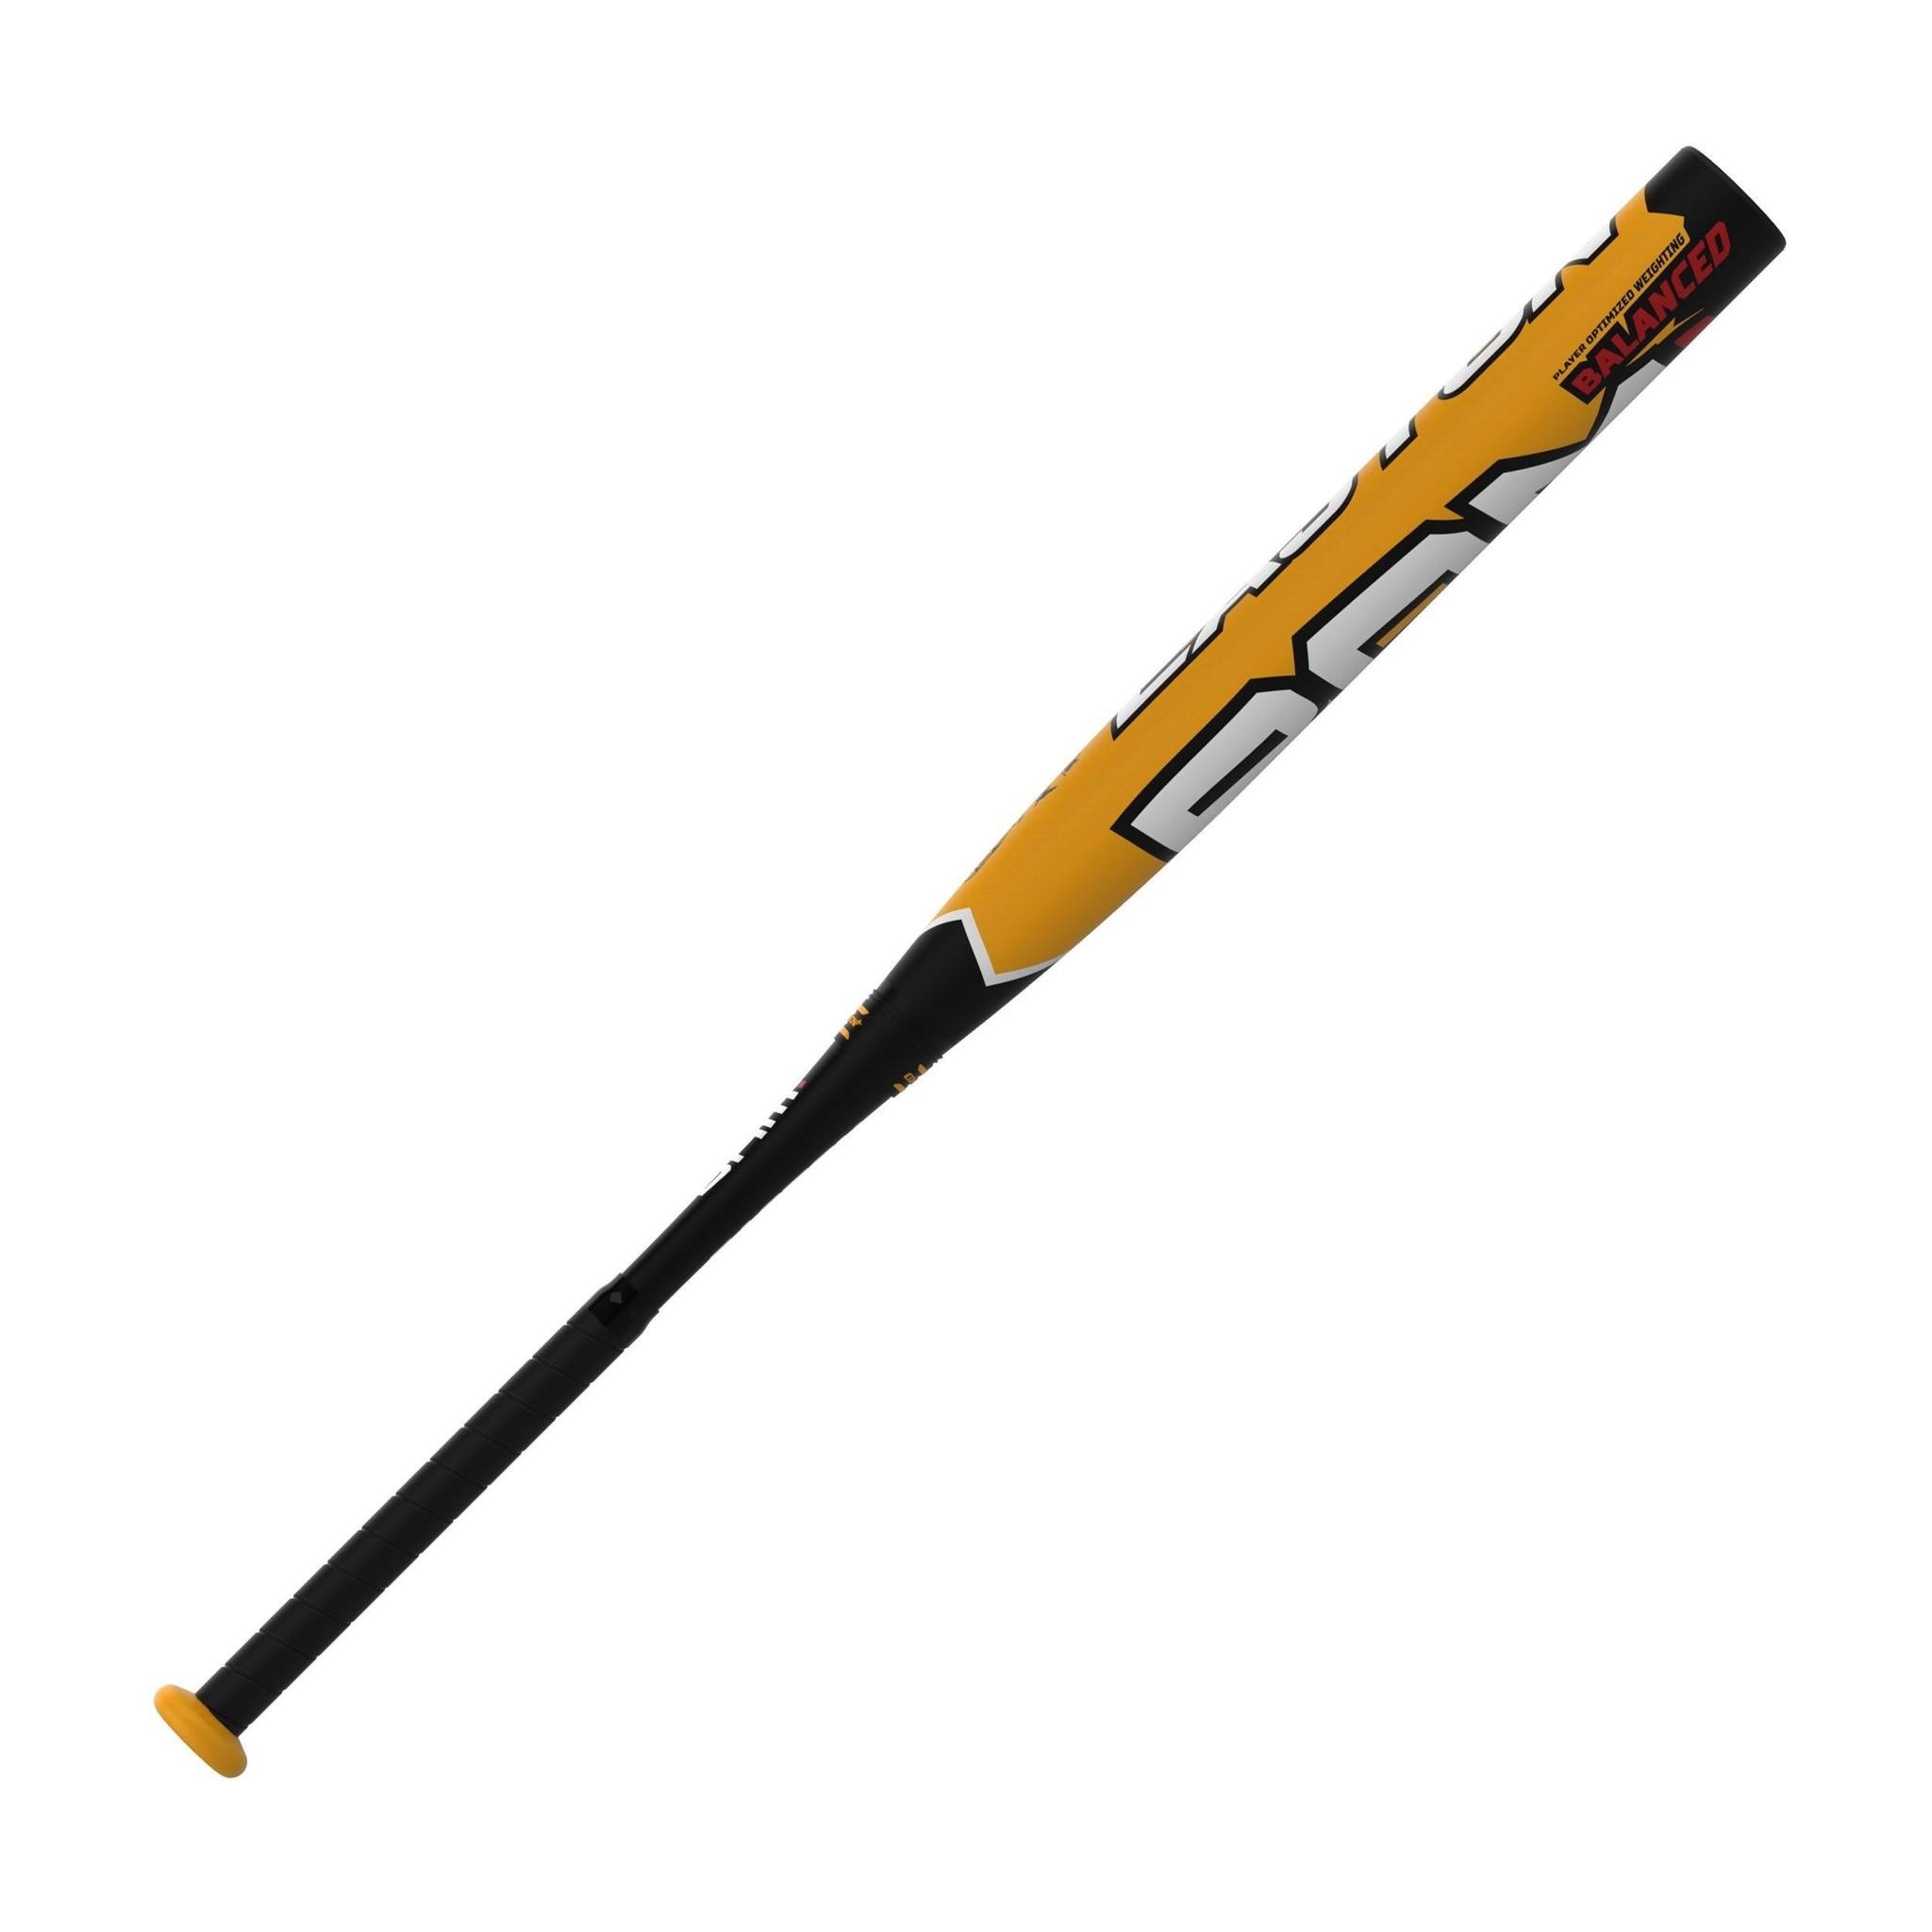 Easton 2020 EASTON FIRE FLEX COMIC BAM 13.5 SOFTBALL BAT